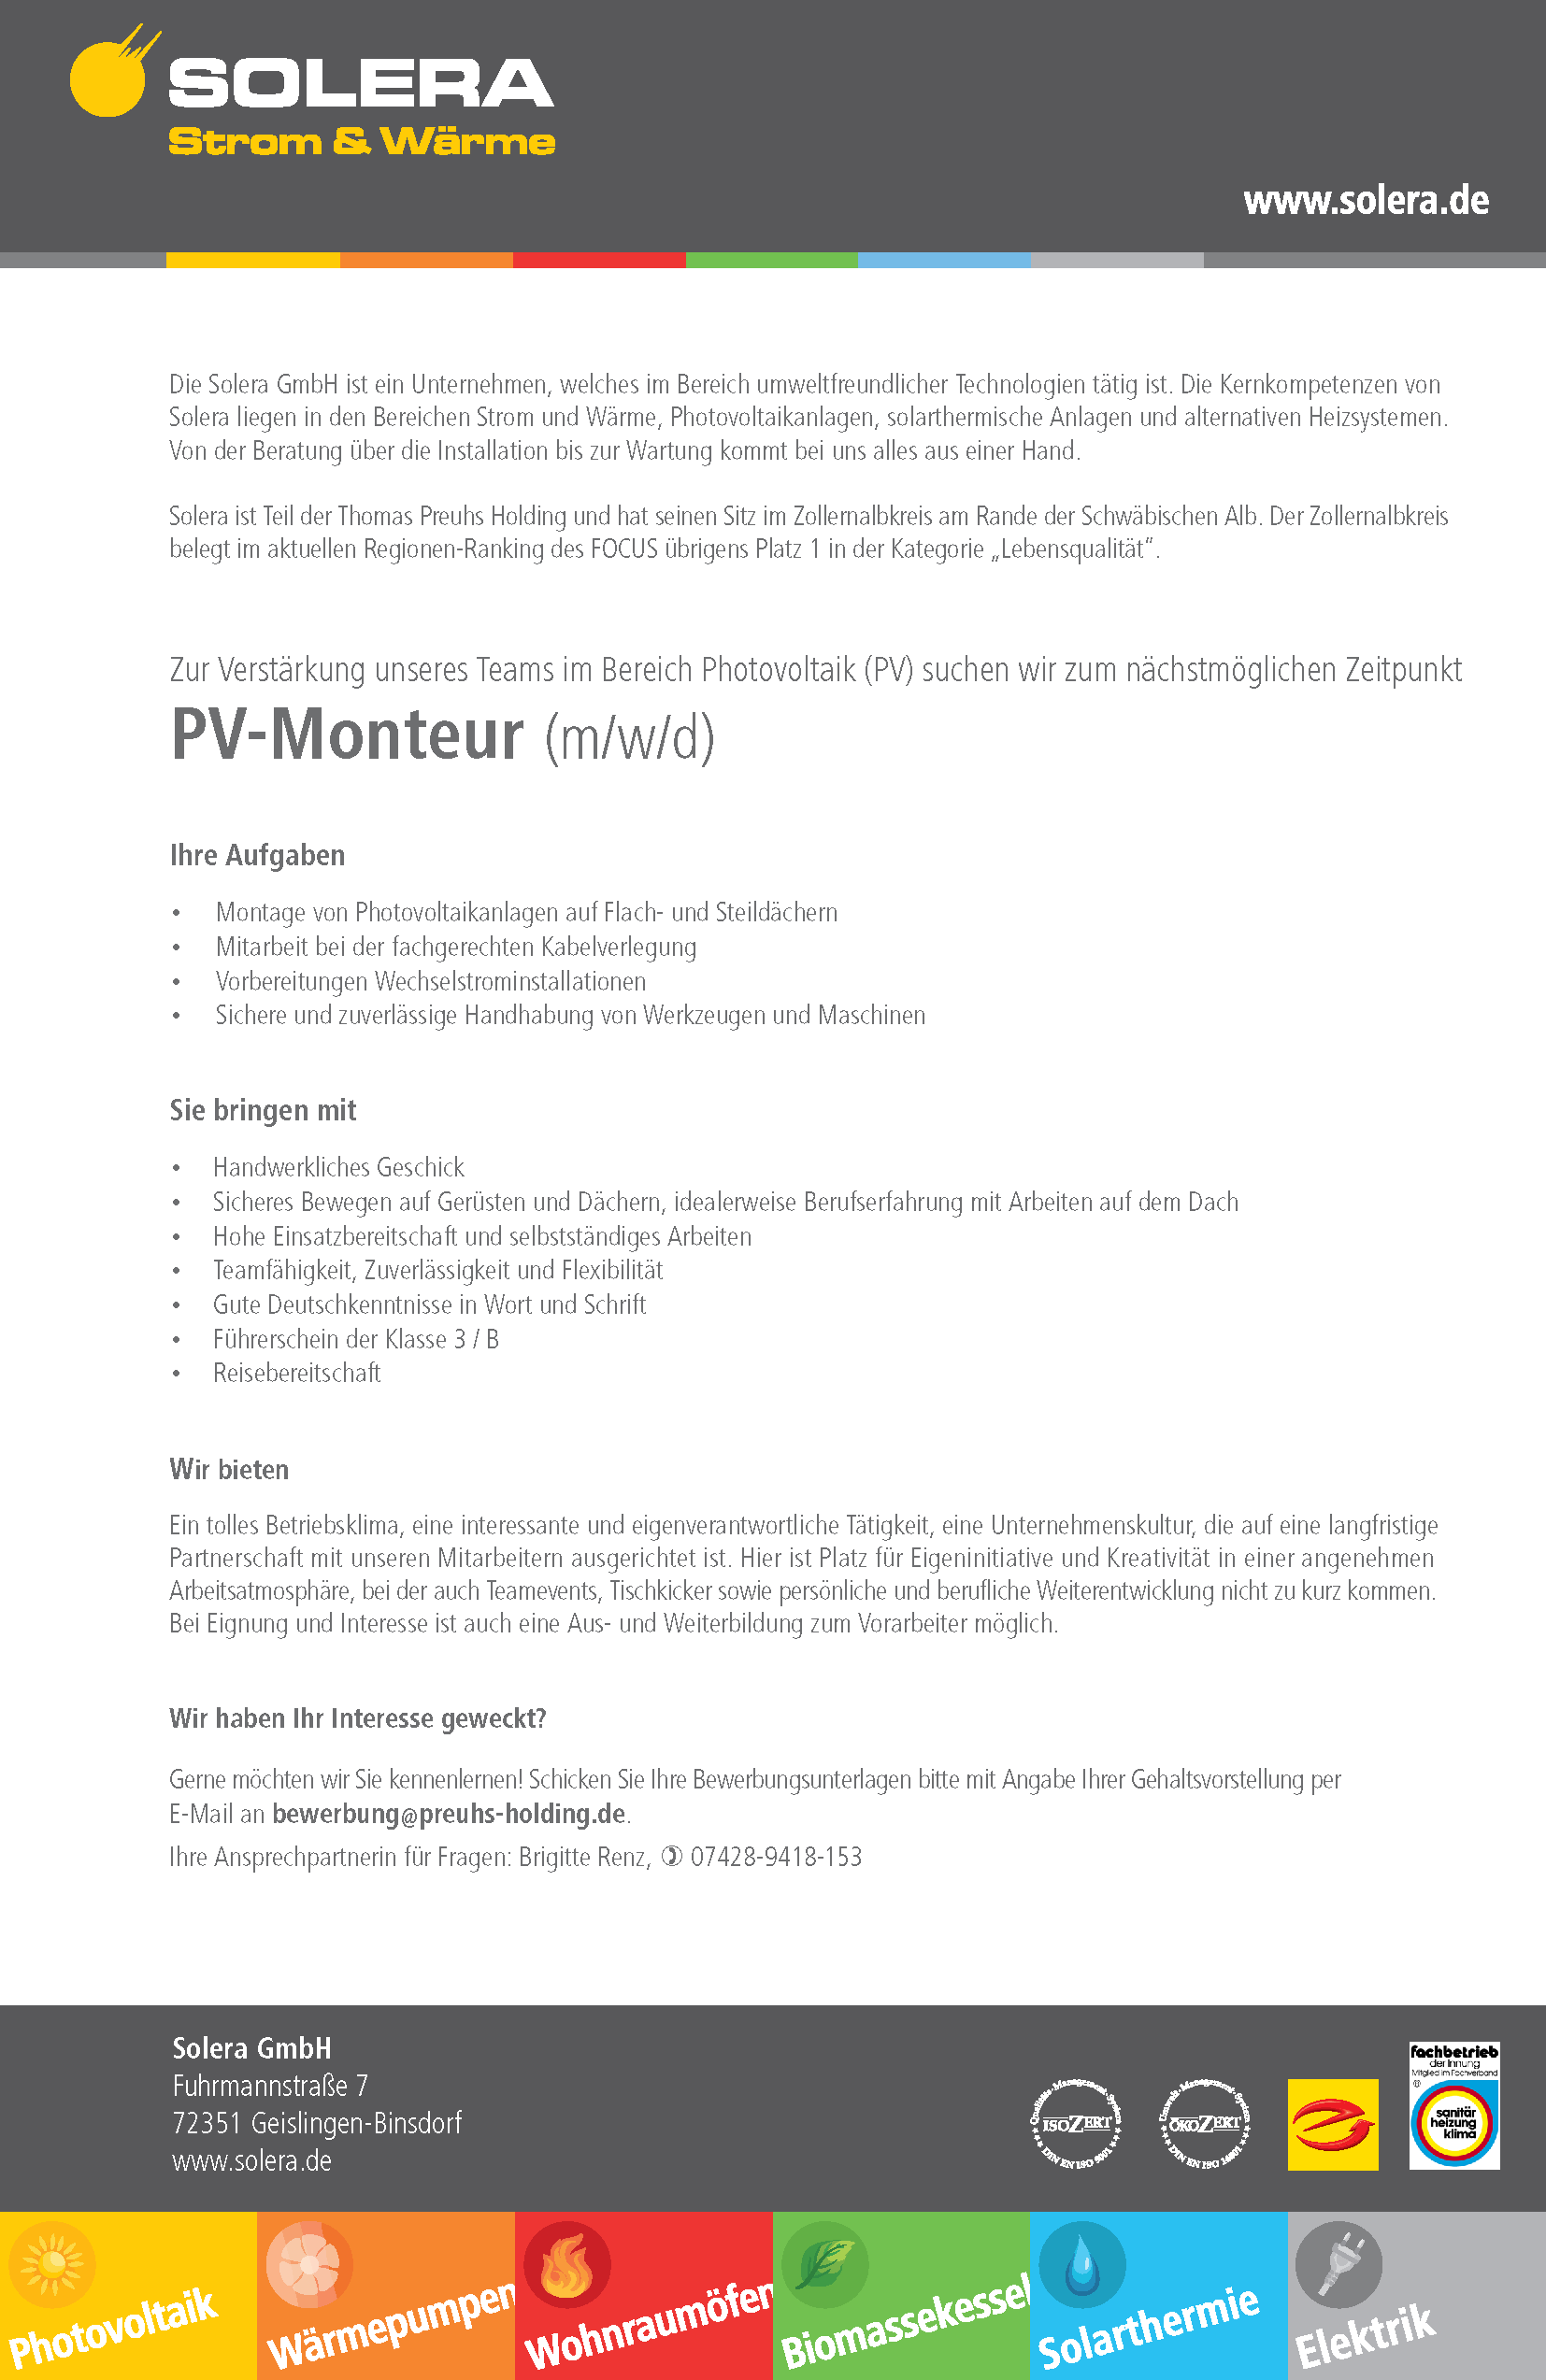 Solera Stellenangebot PV-Monteur